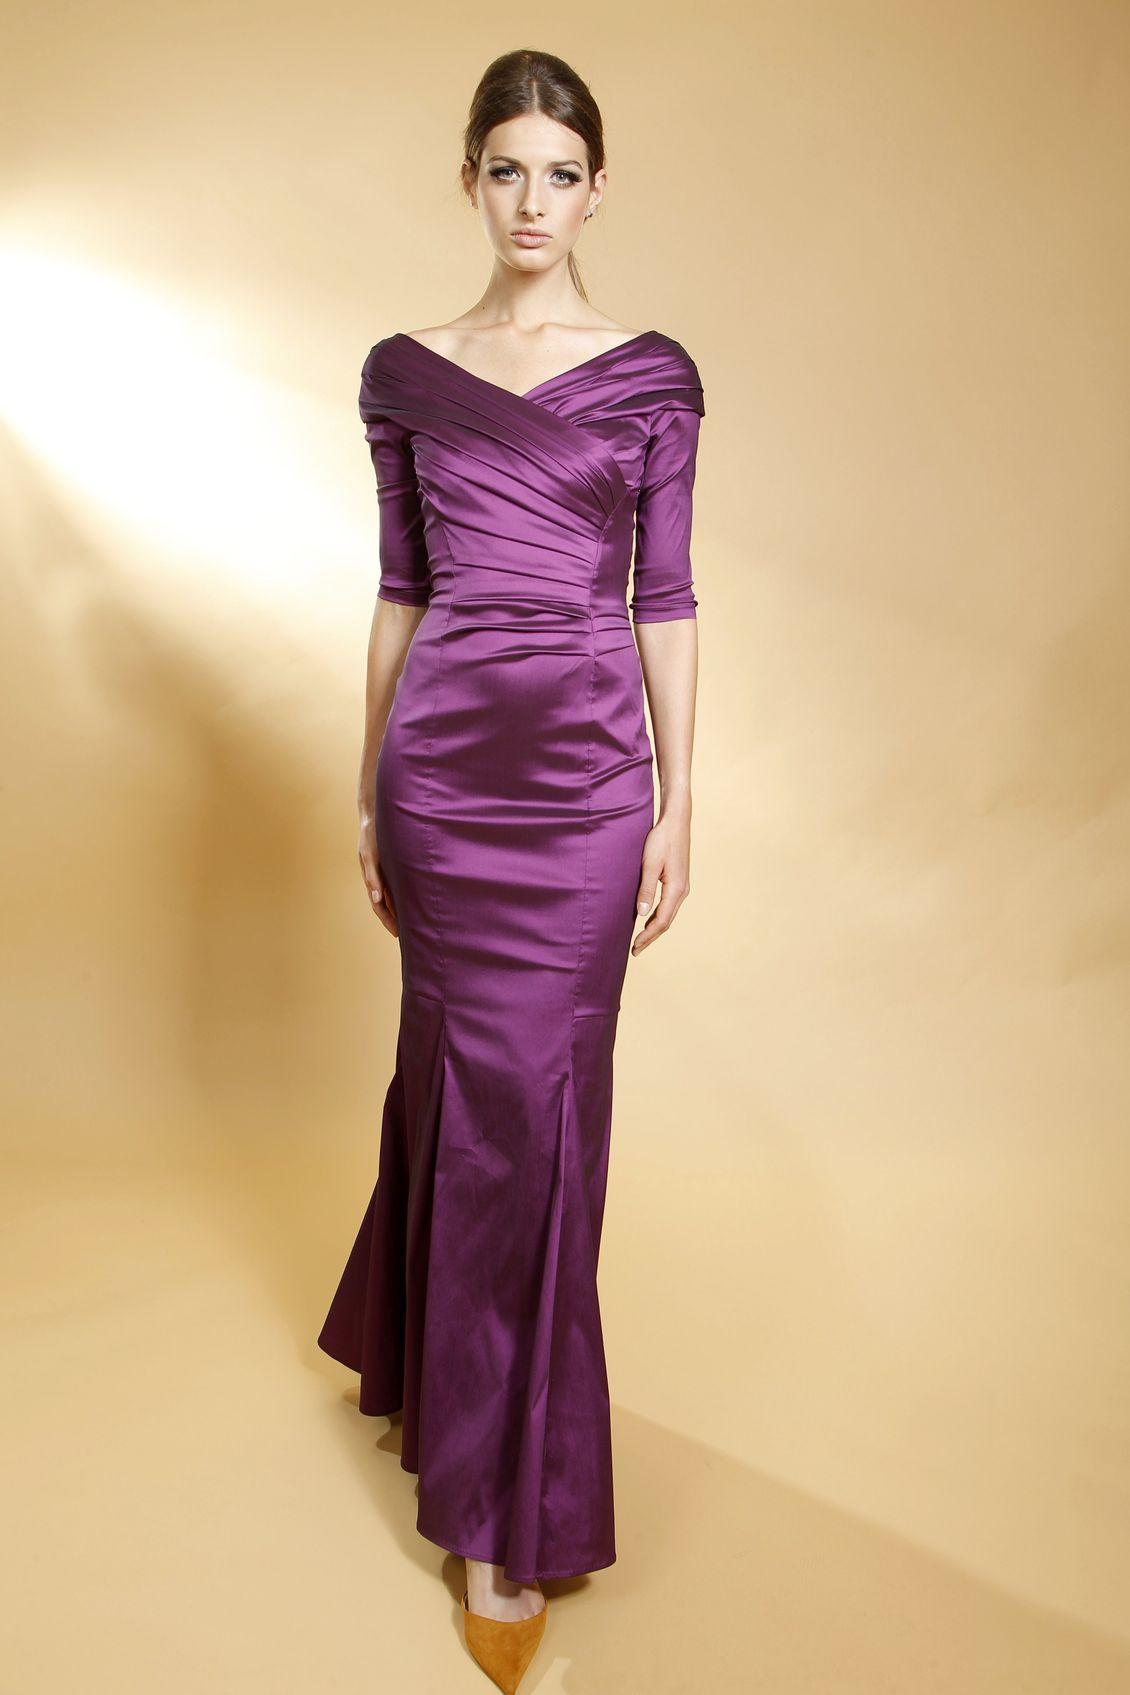 sonja kiefer kollektion 37306 0300 my fair lady | glamouröse